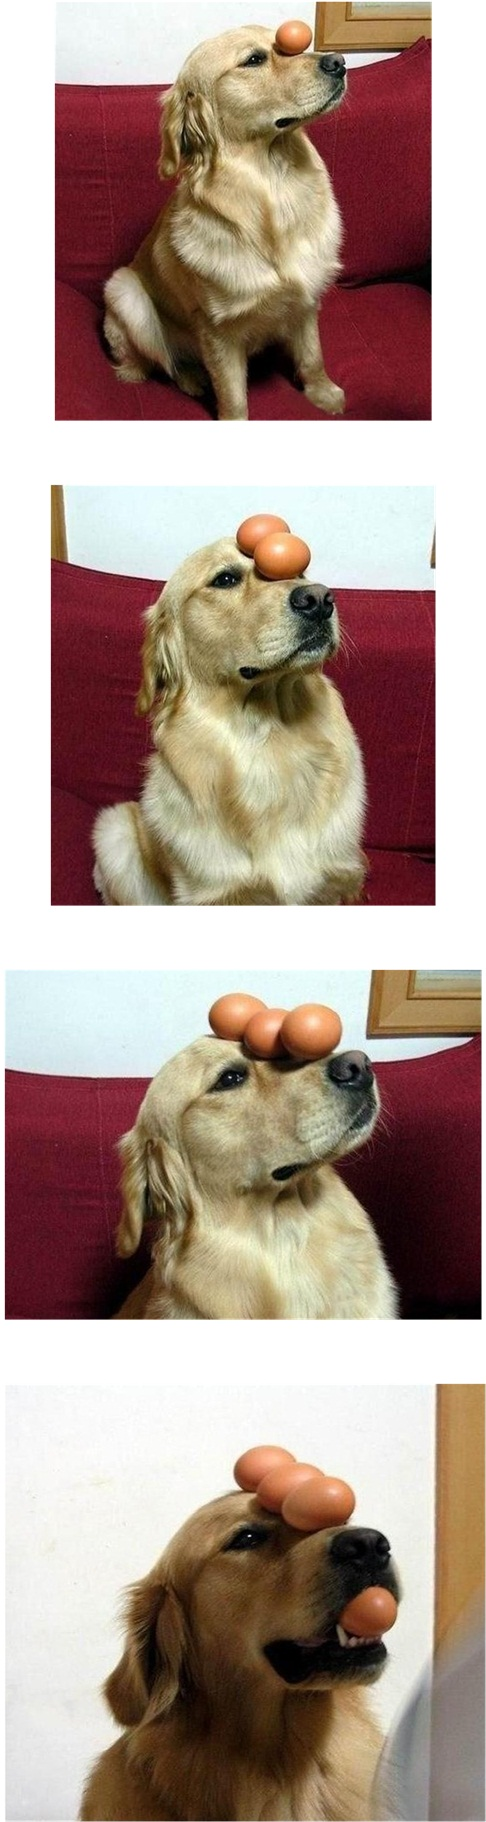 dog-balancing-eggs